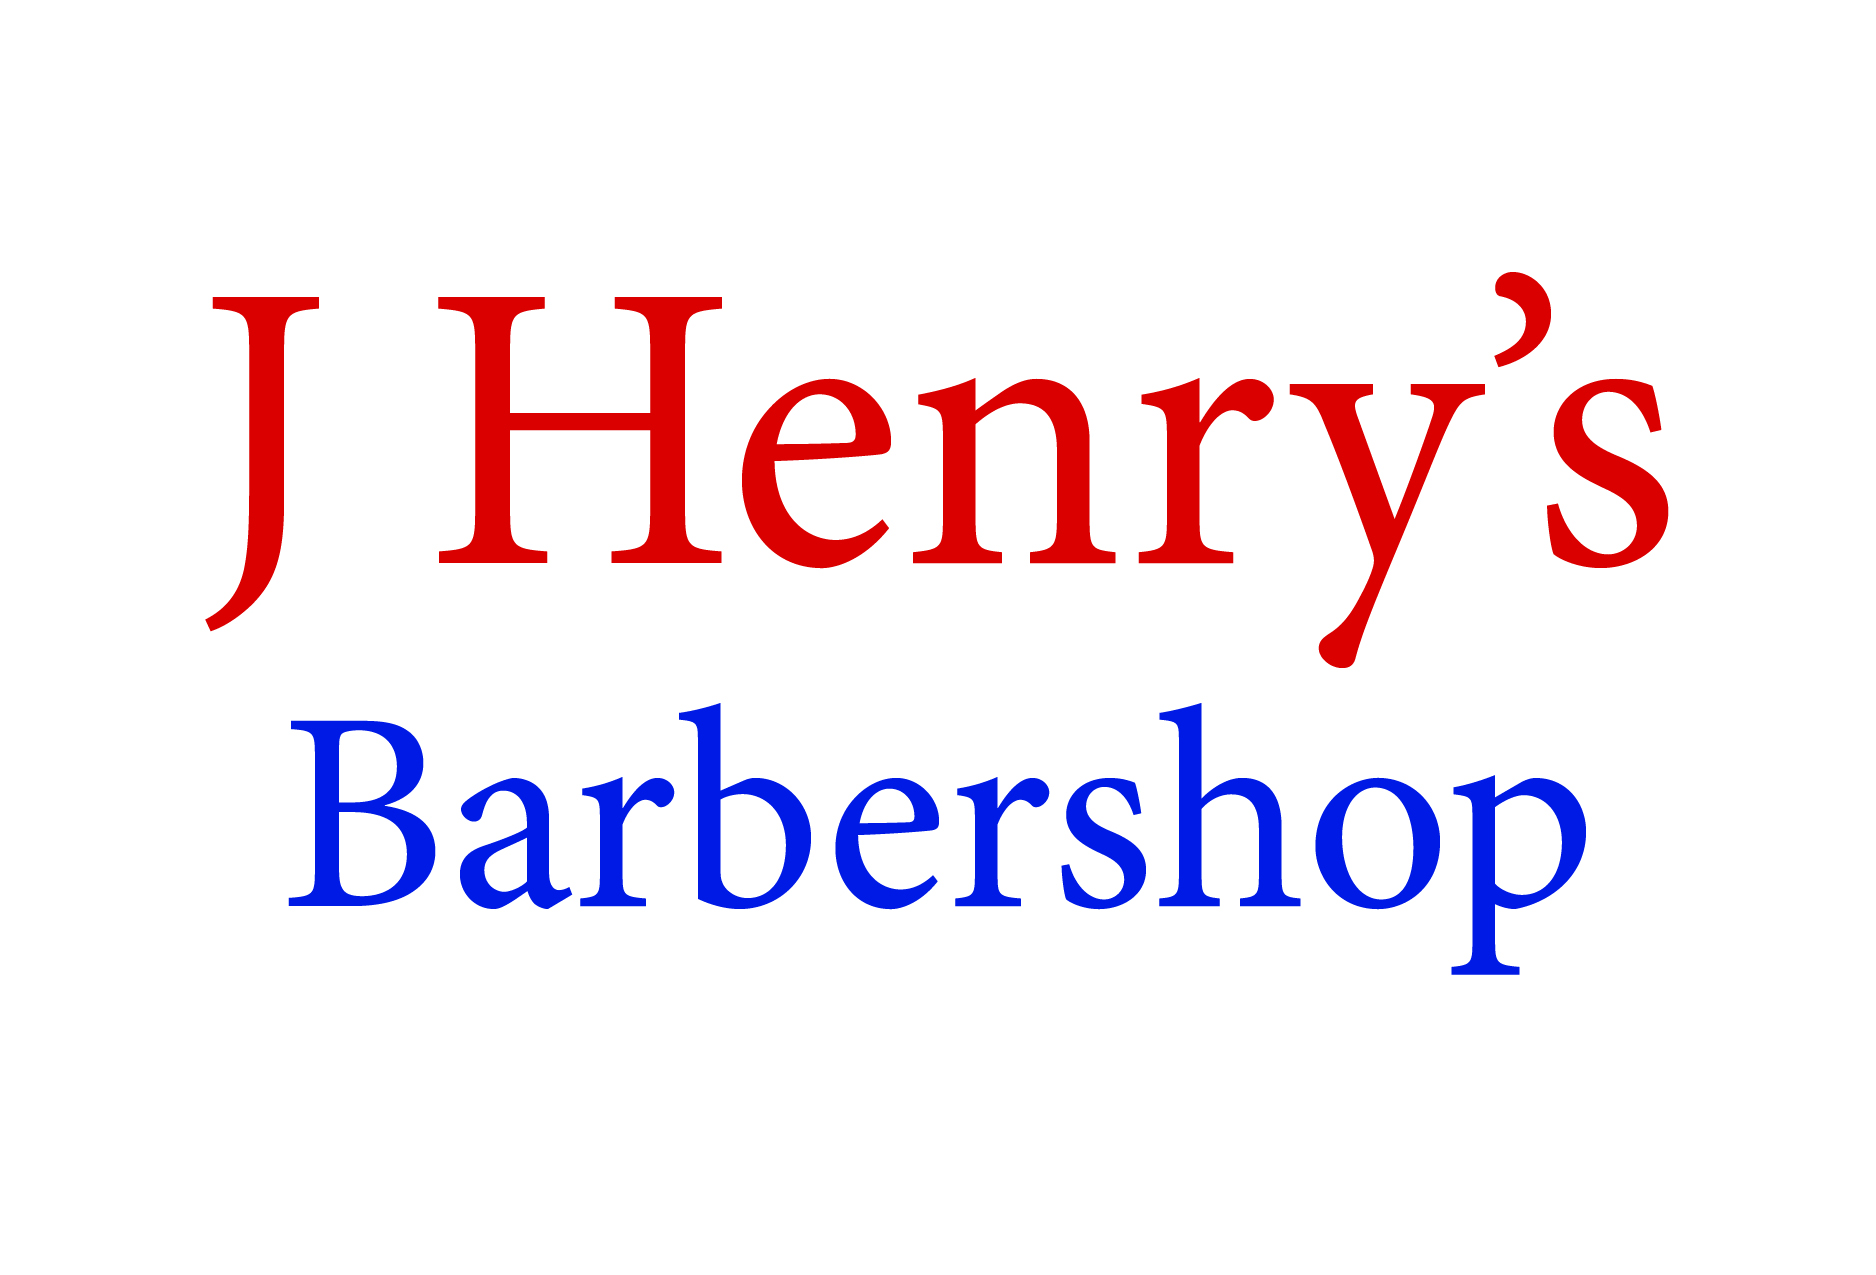 J Henry's Barbershop